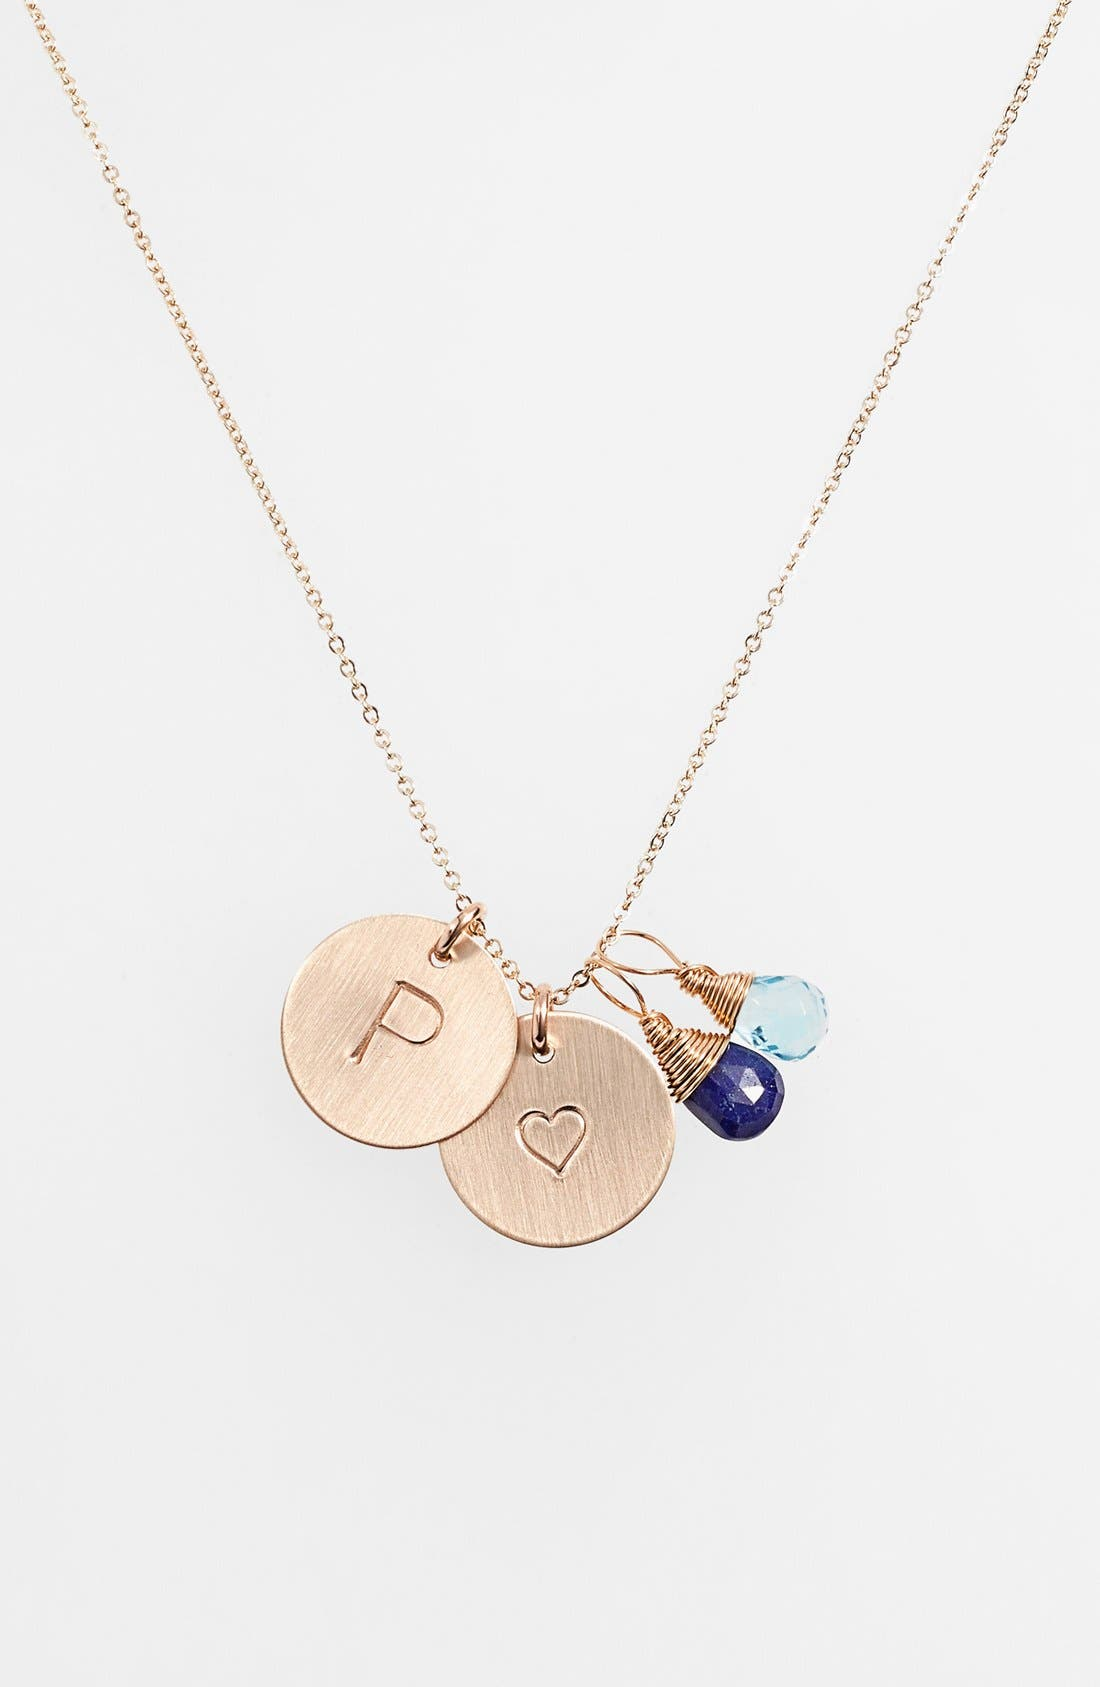 Blue Quartz Initial & Heart 14k-Gold Fill Disc Necklace,                             Main thumbnail 1, color,                             Royal Blue And Ocean Blue P